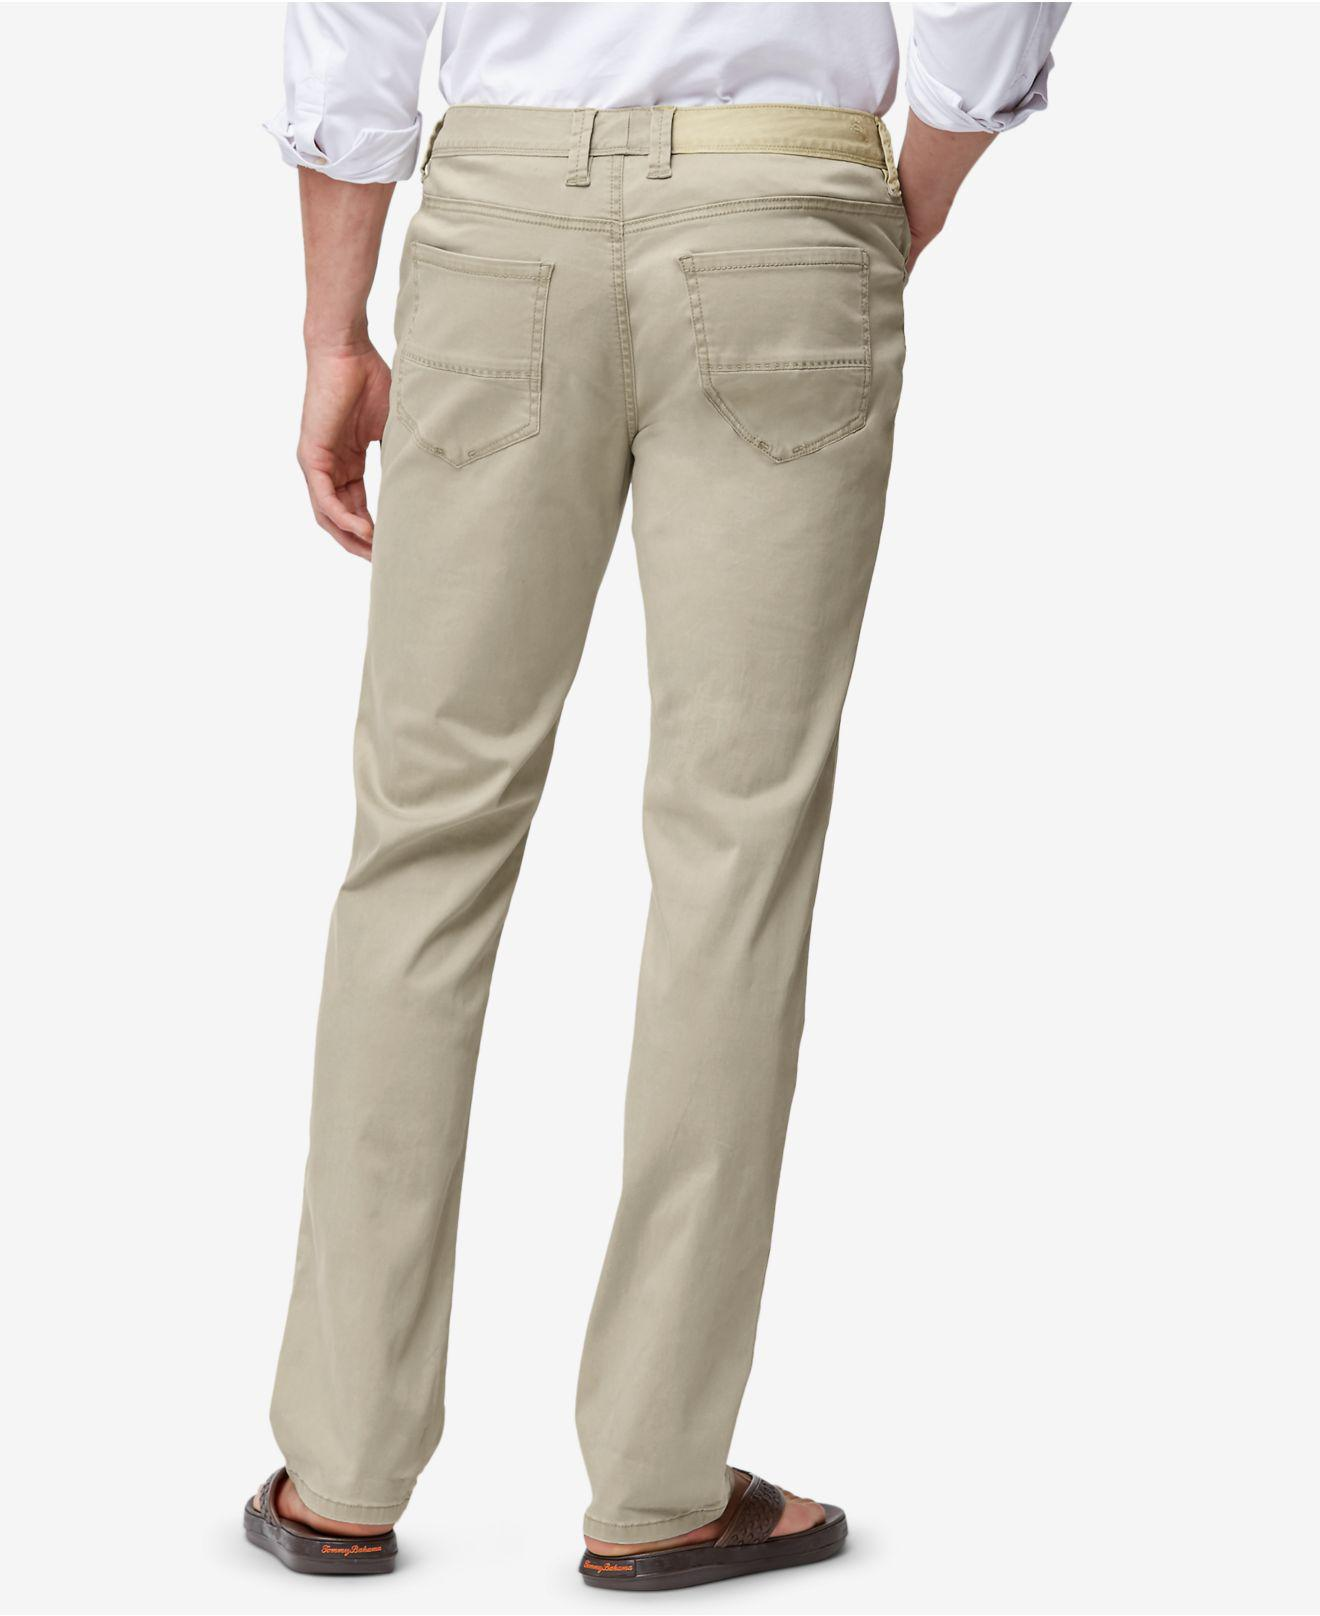 Tommy Bahama Men/'s Chino Beige Montana Vintage Cargo Pants $125